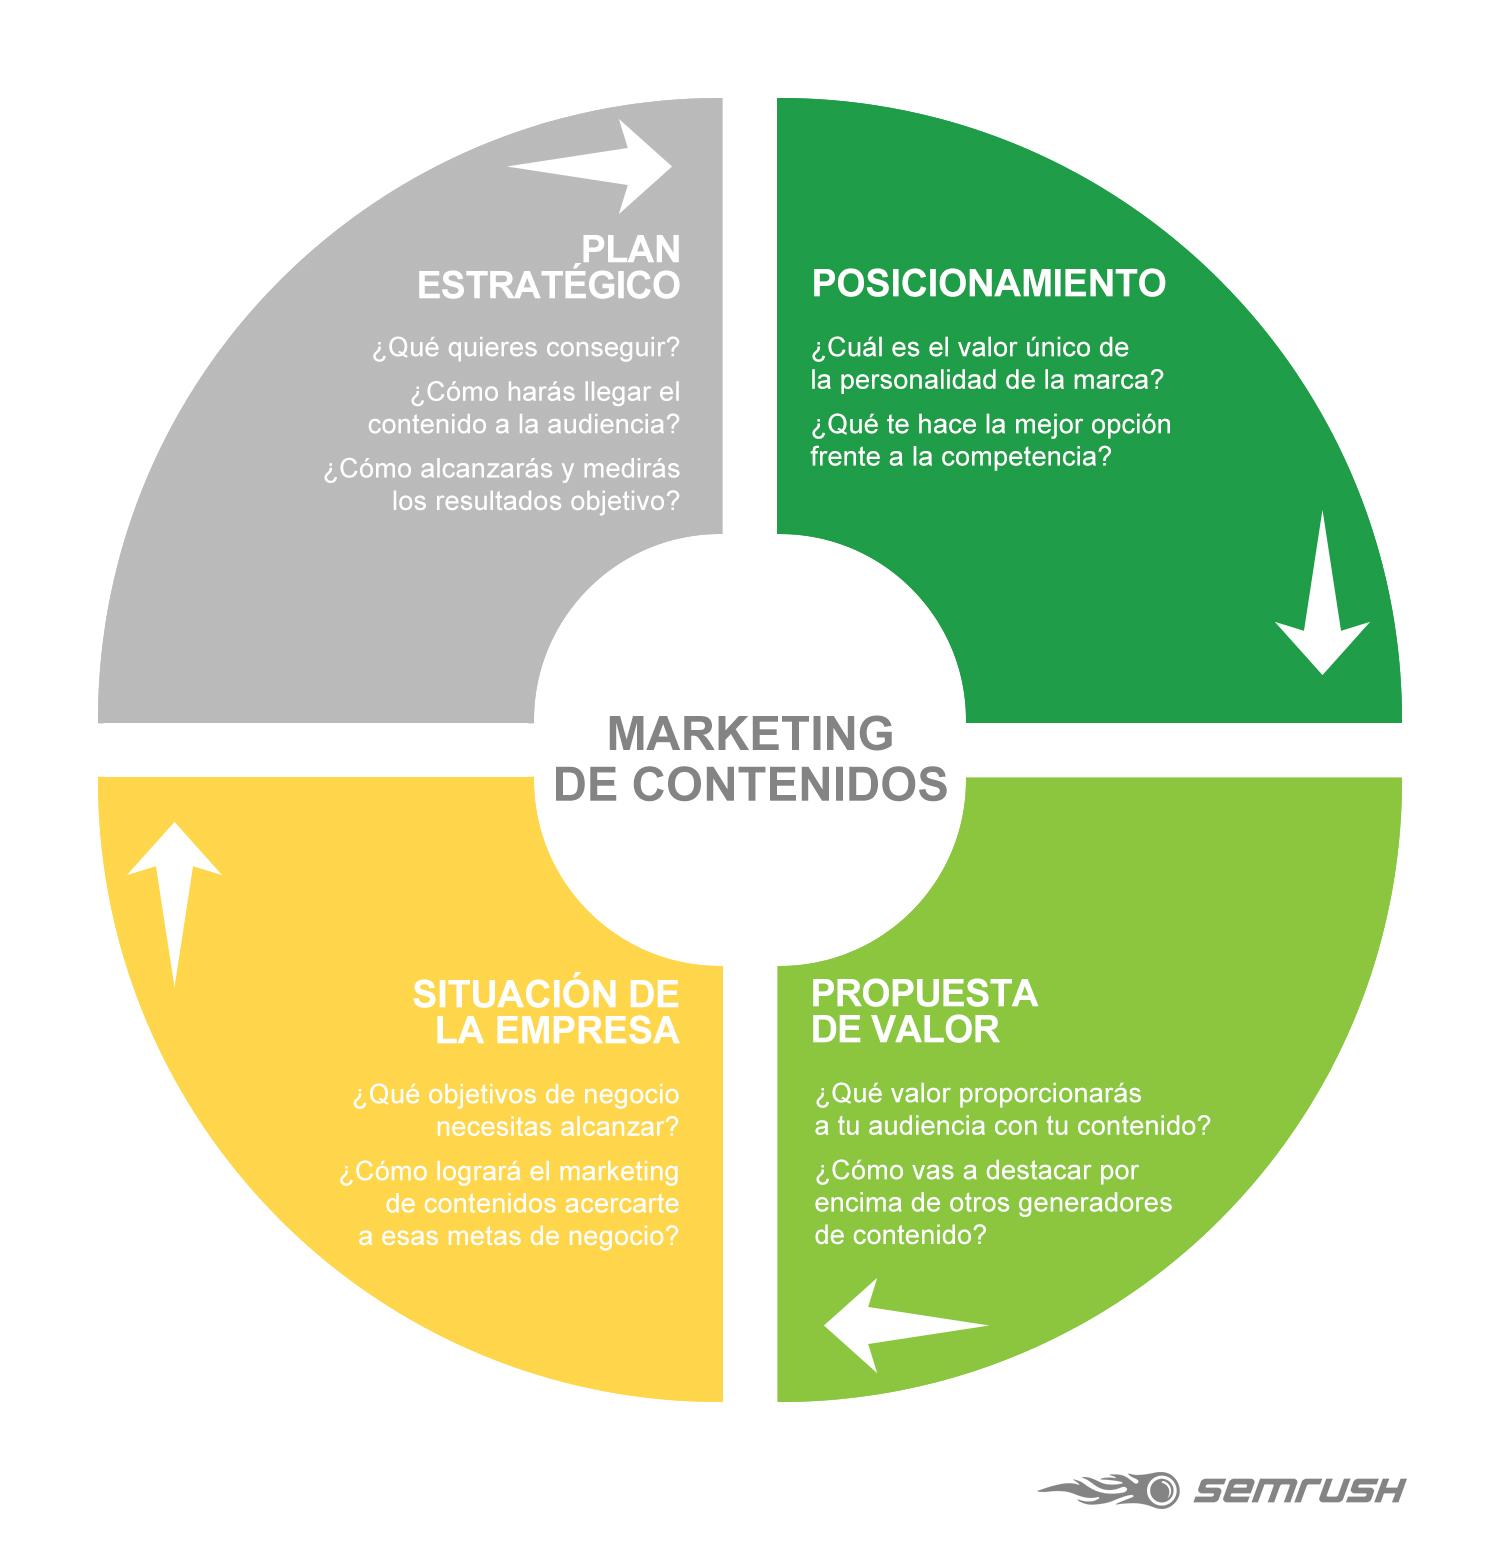 4 elementos básicos del Marketing de contenidos #infografia #infographic #marketing